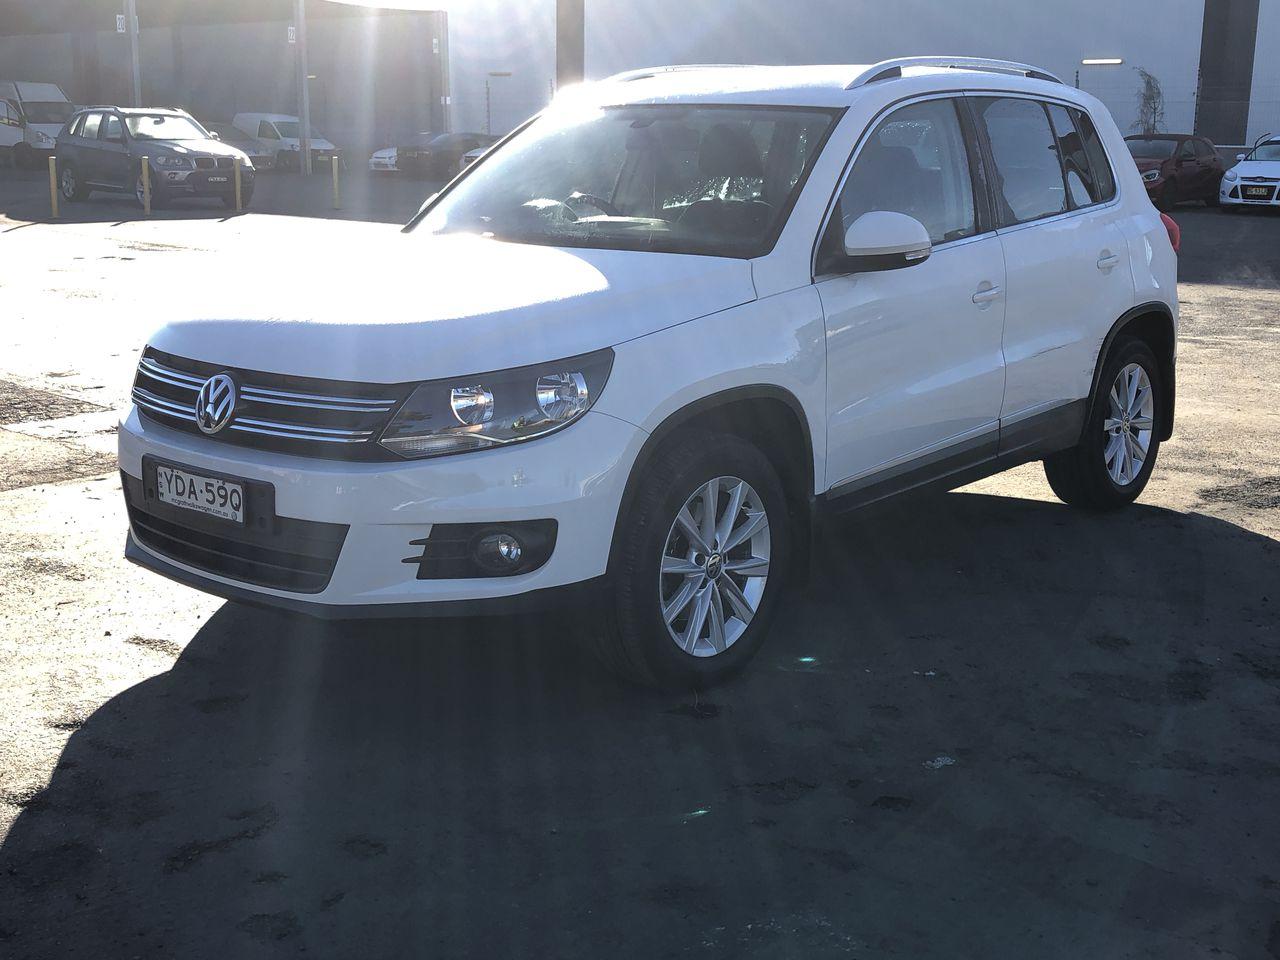 2012 Volkswagen Tiguan 115 TSI Auto SUV 85,690kms